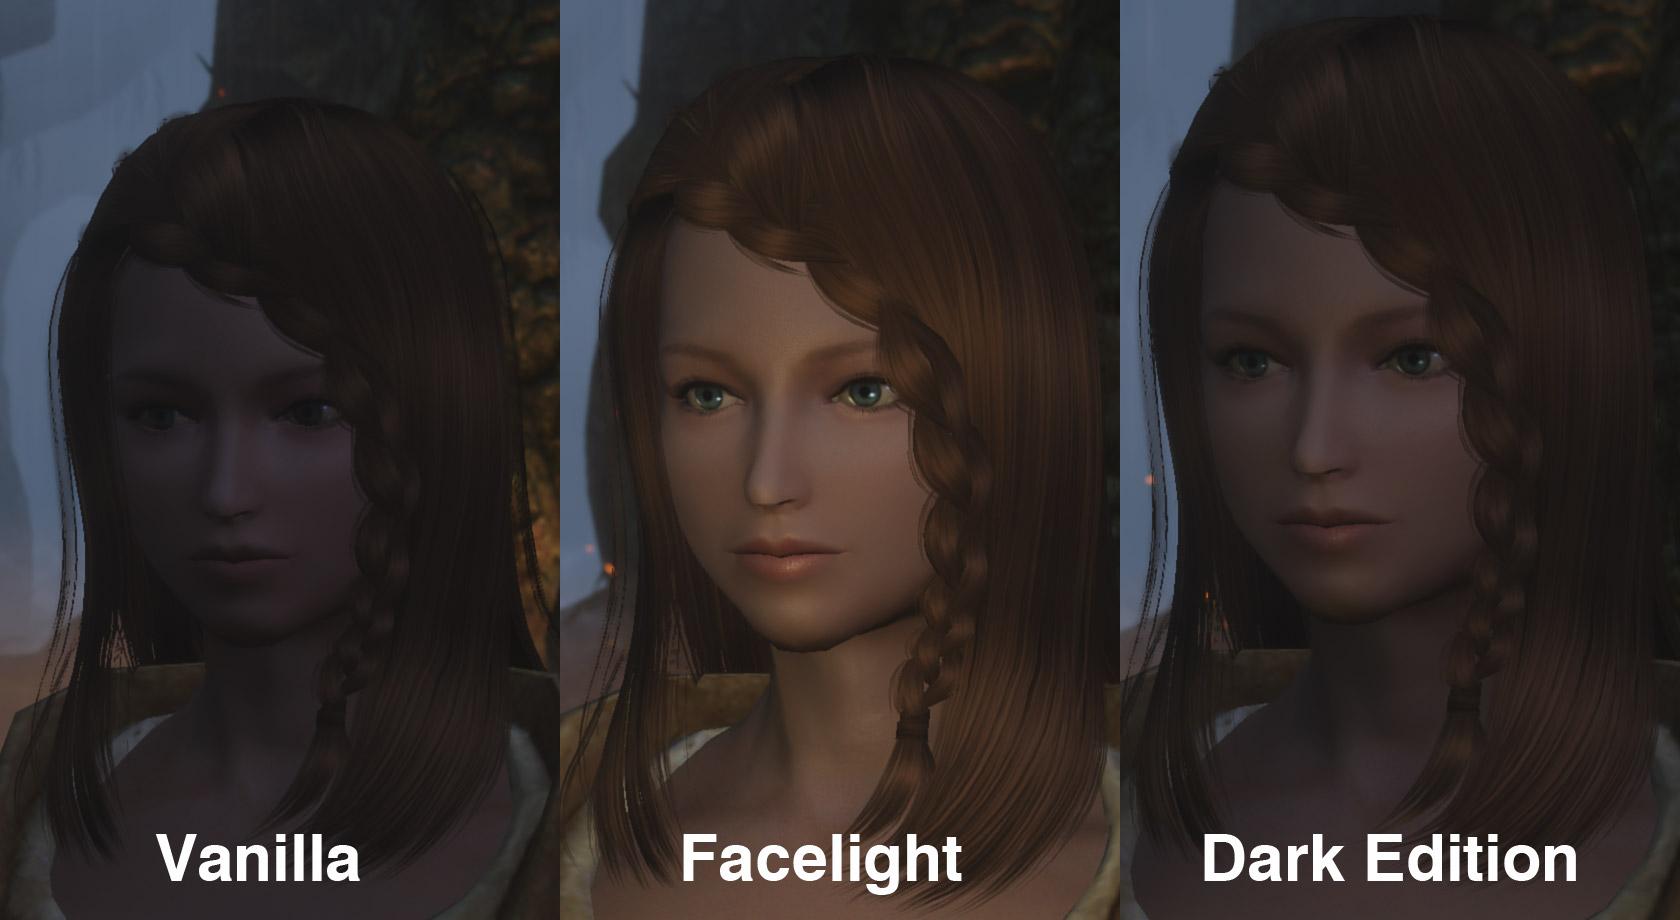 face light 日本語化対応 魔法 呪文 エンチャント skyrim mod